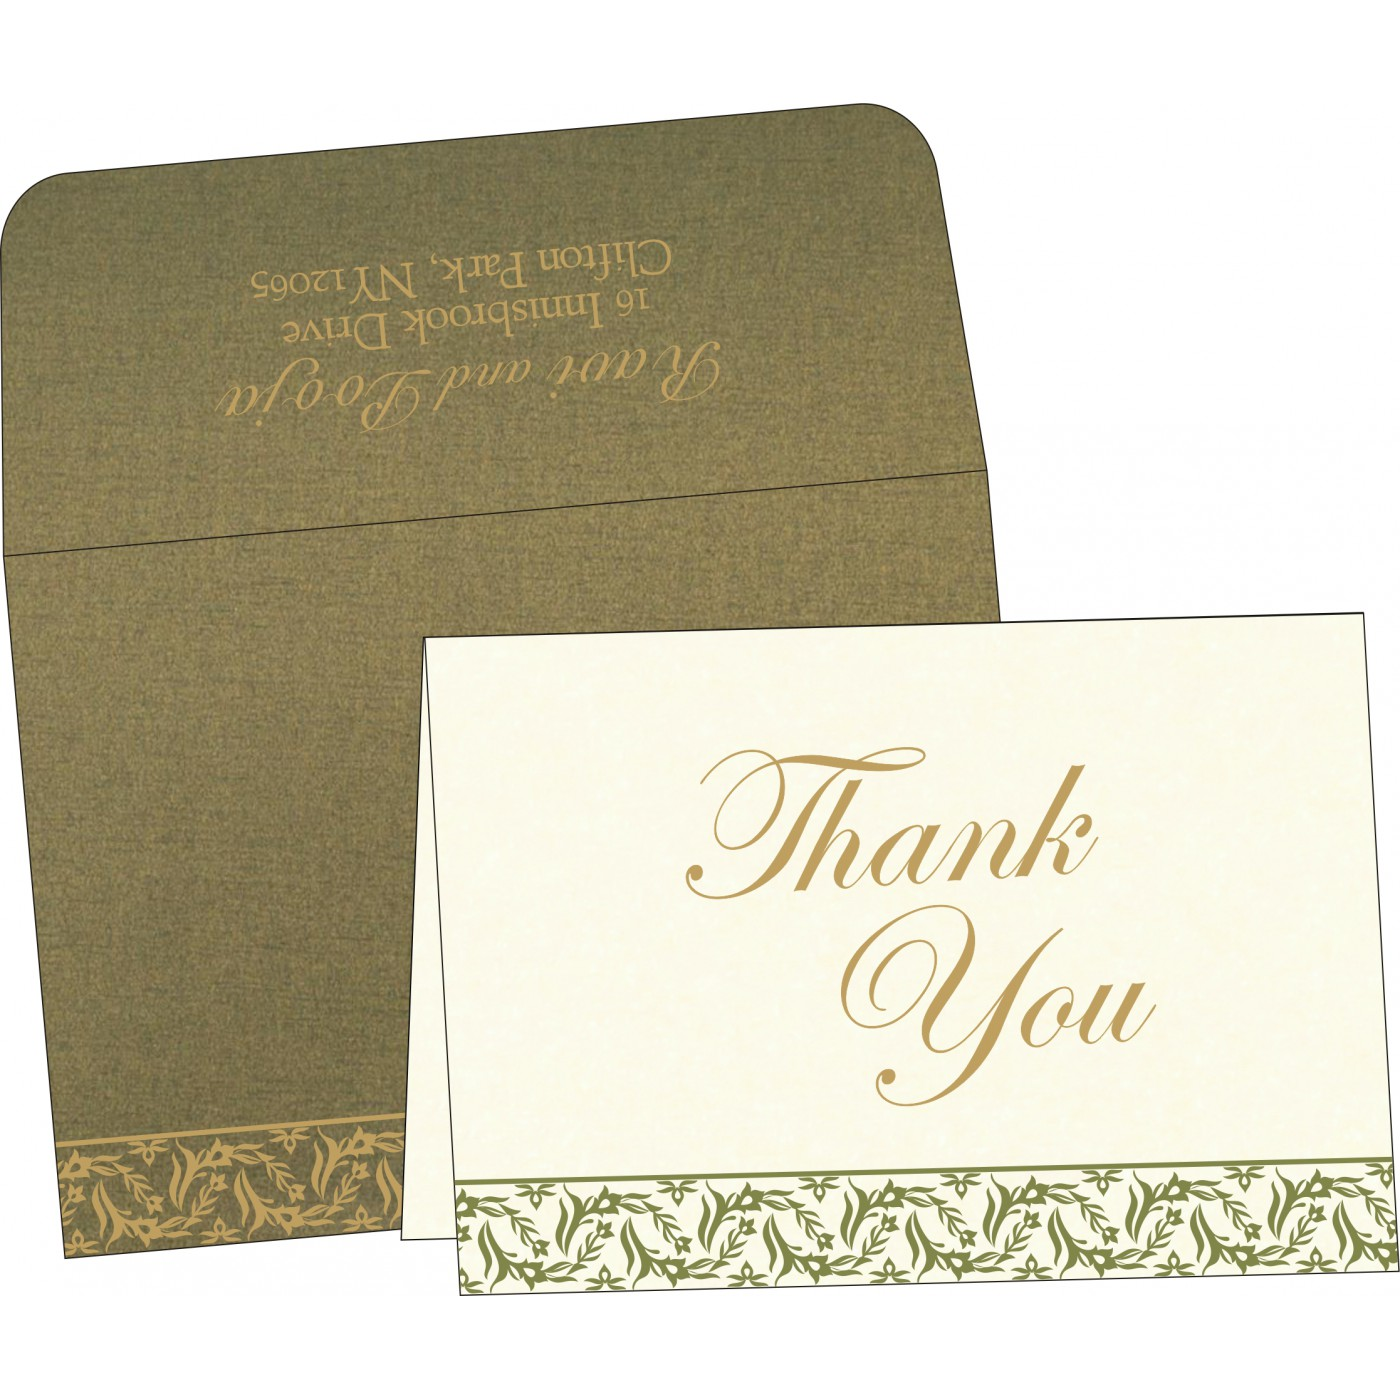 Thank You Cards - TYC-8249E